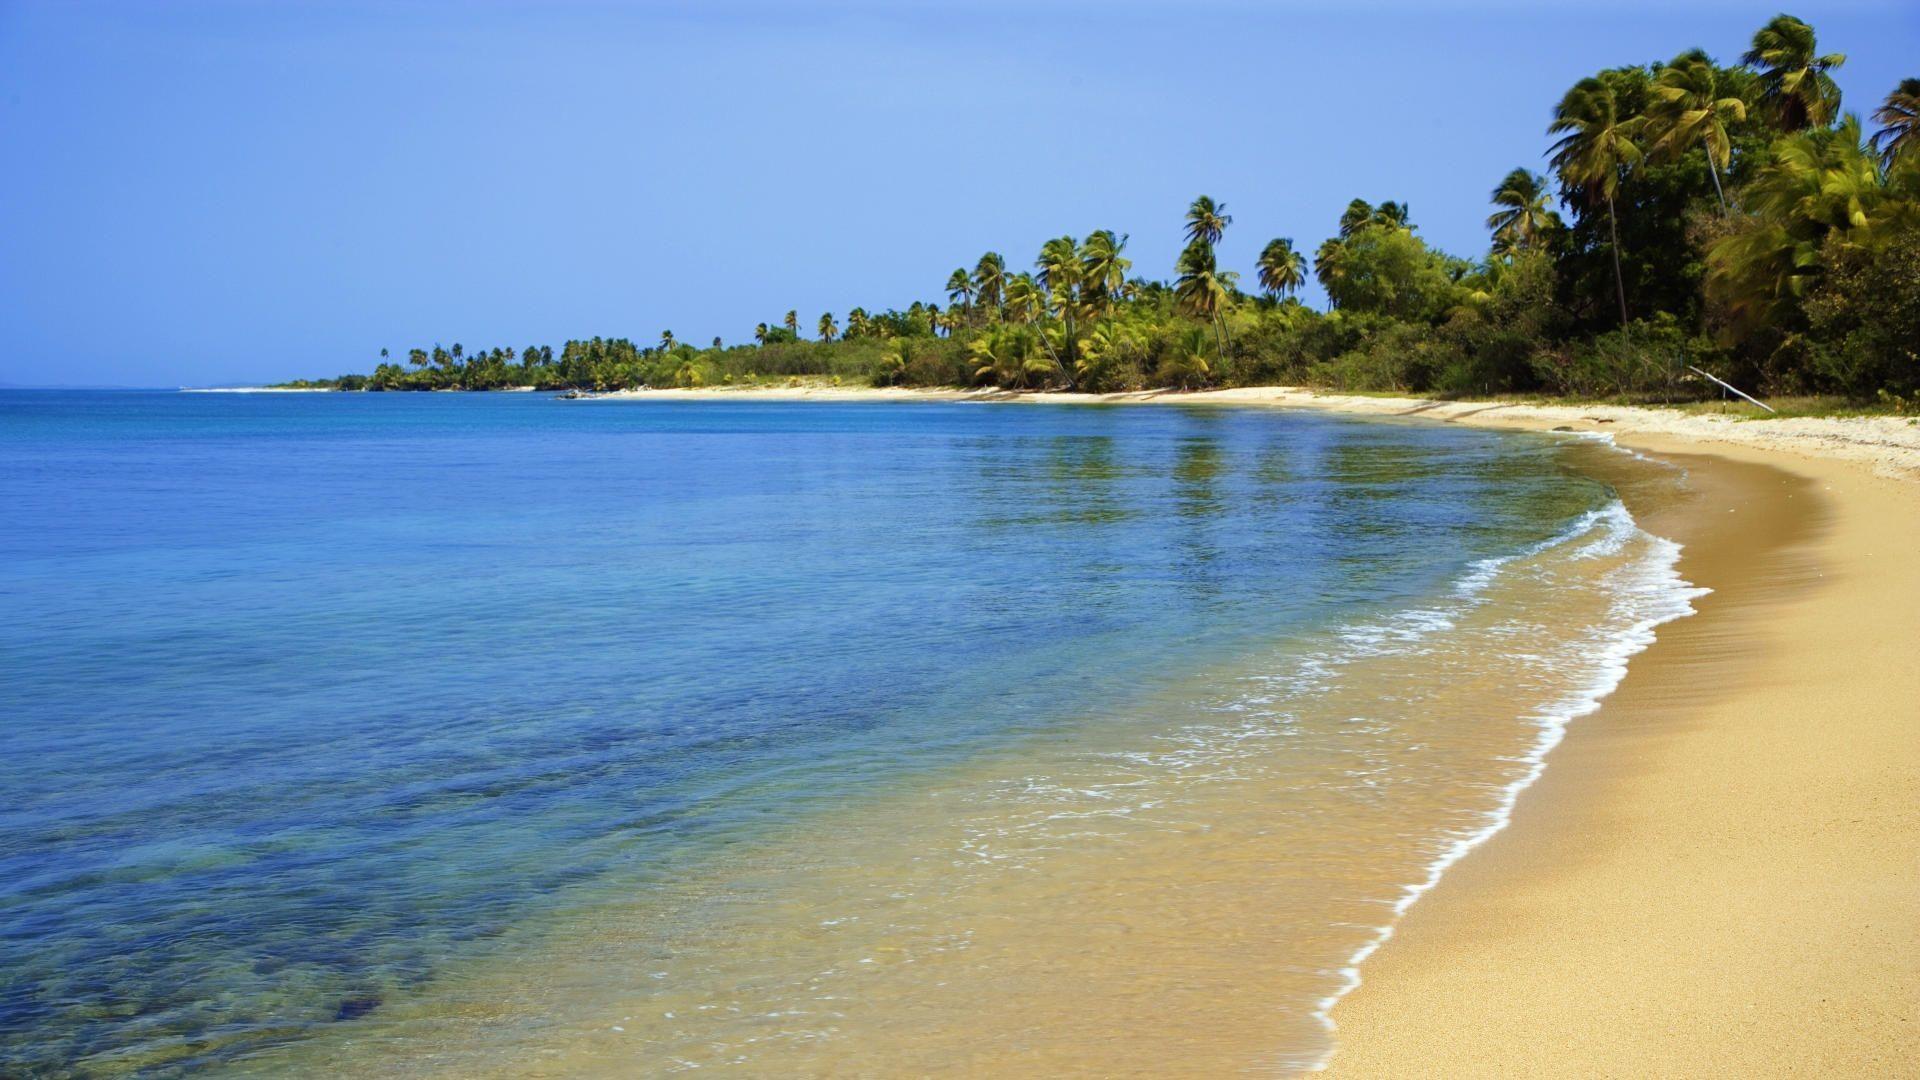 Tropical Beach Desktop Wallpapers Group 83